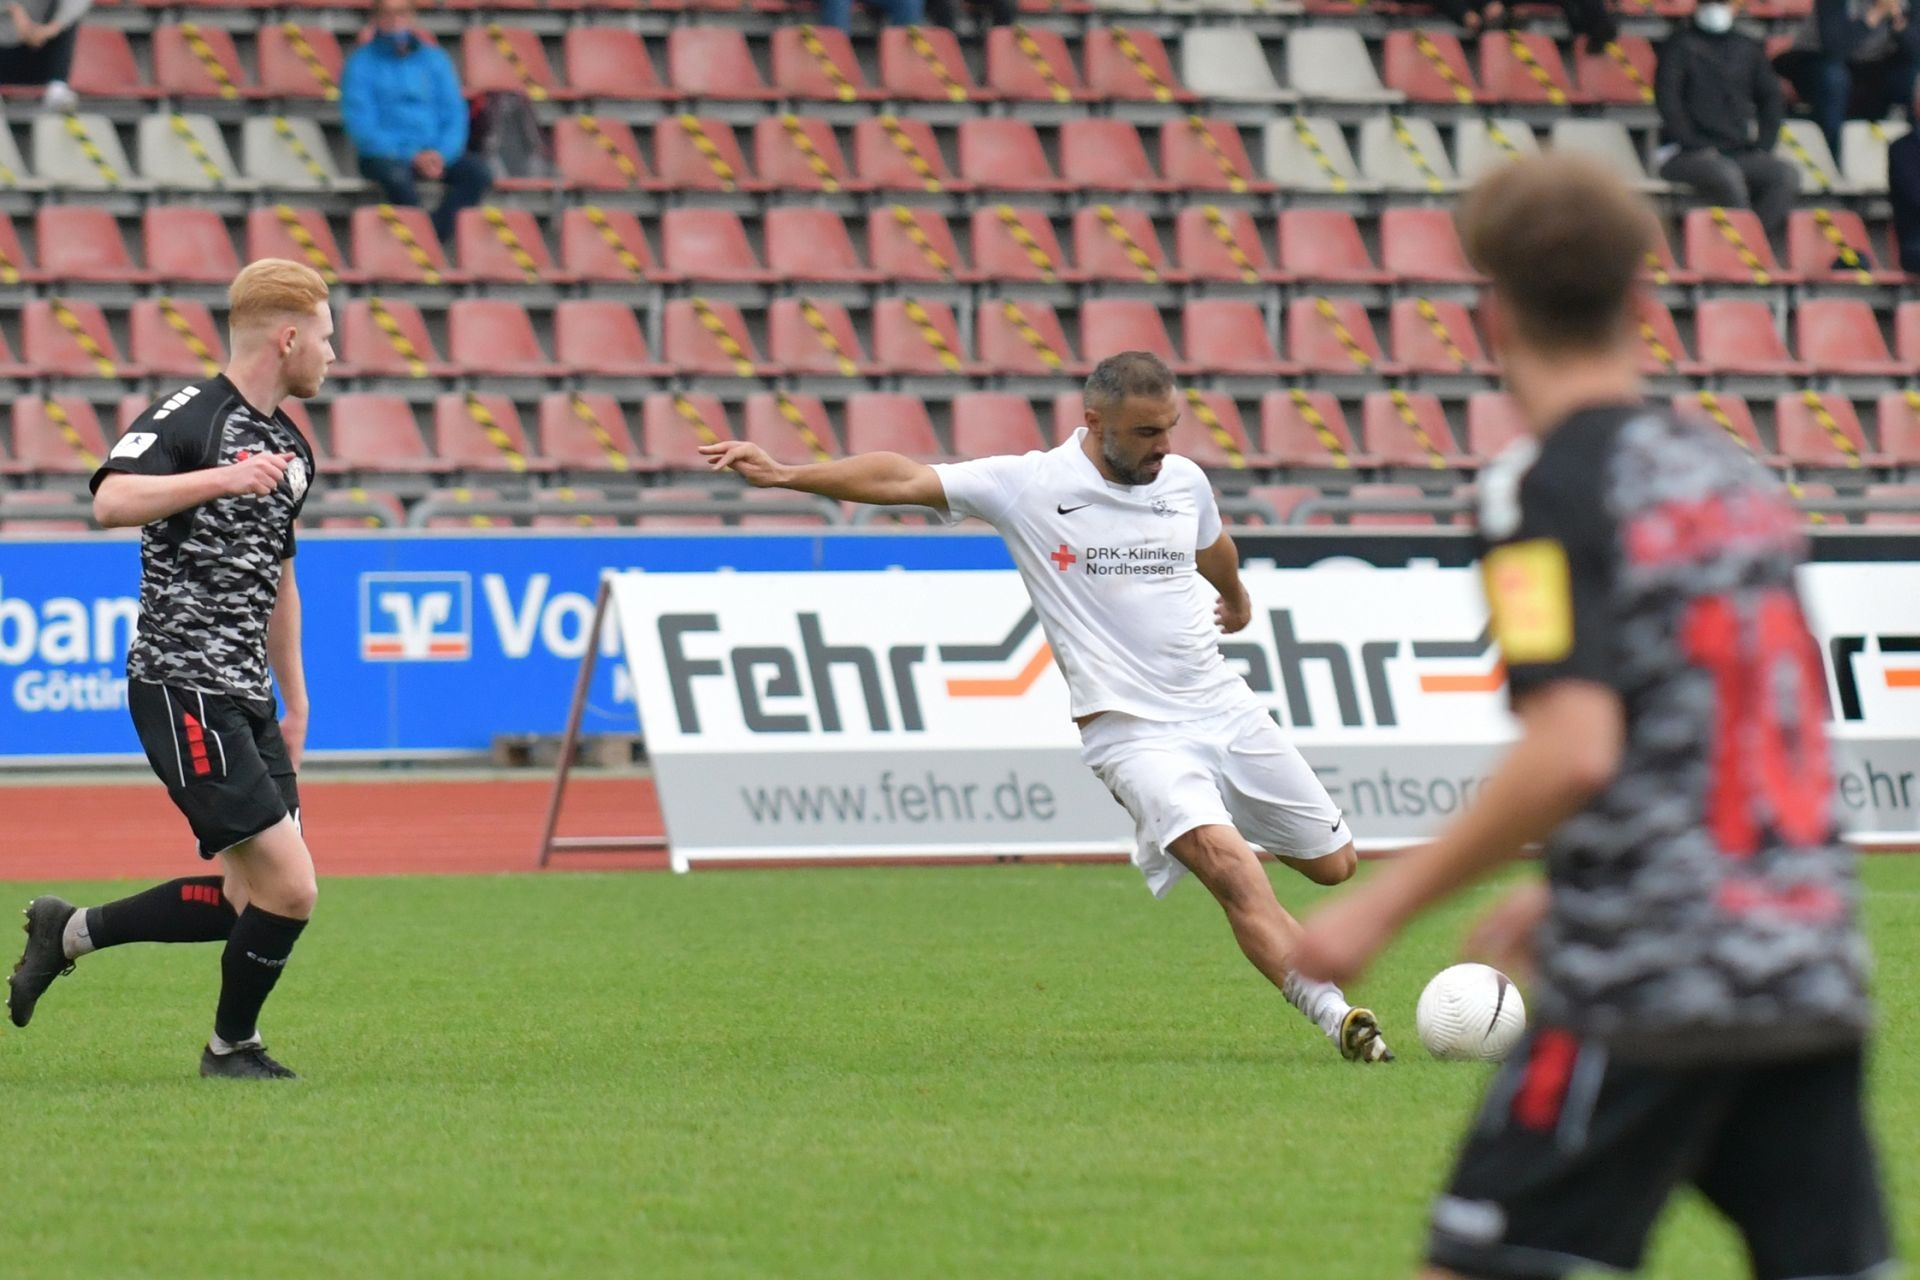 Regionalliga Südwest 2020/21, KSV Hessen Kassel, Rot-Weiss-Koblenz, Endstand 1:1, Mahir Saglik